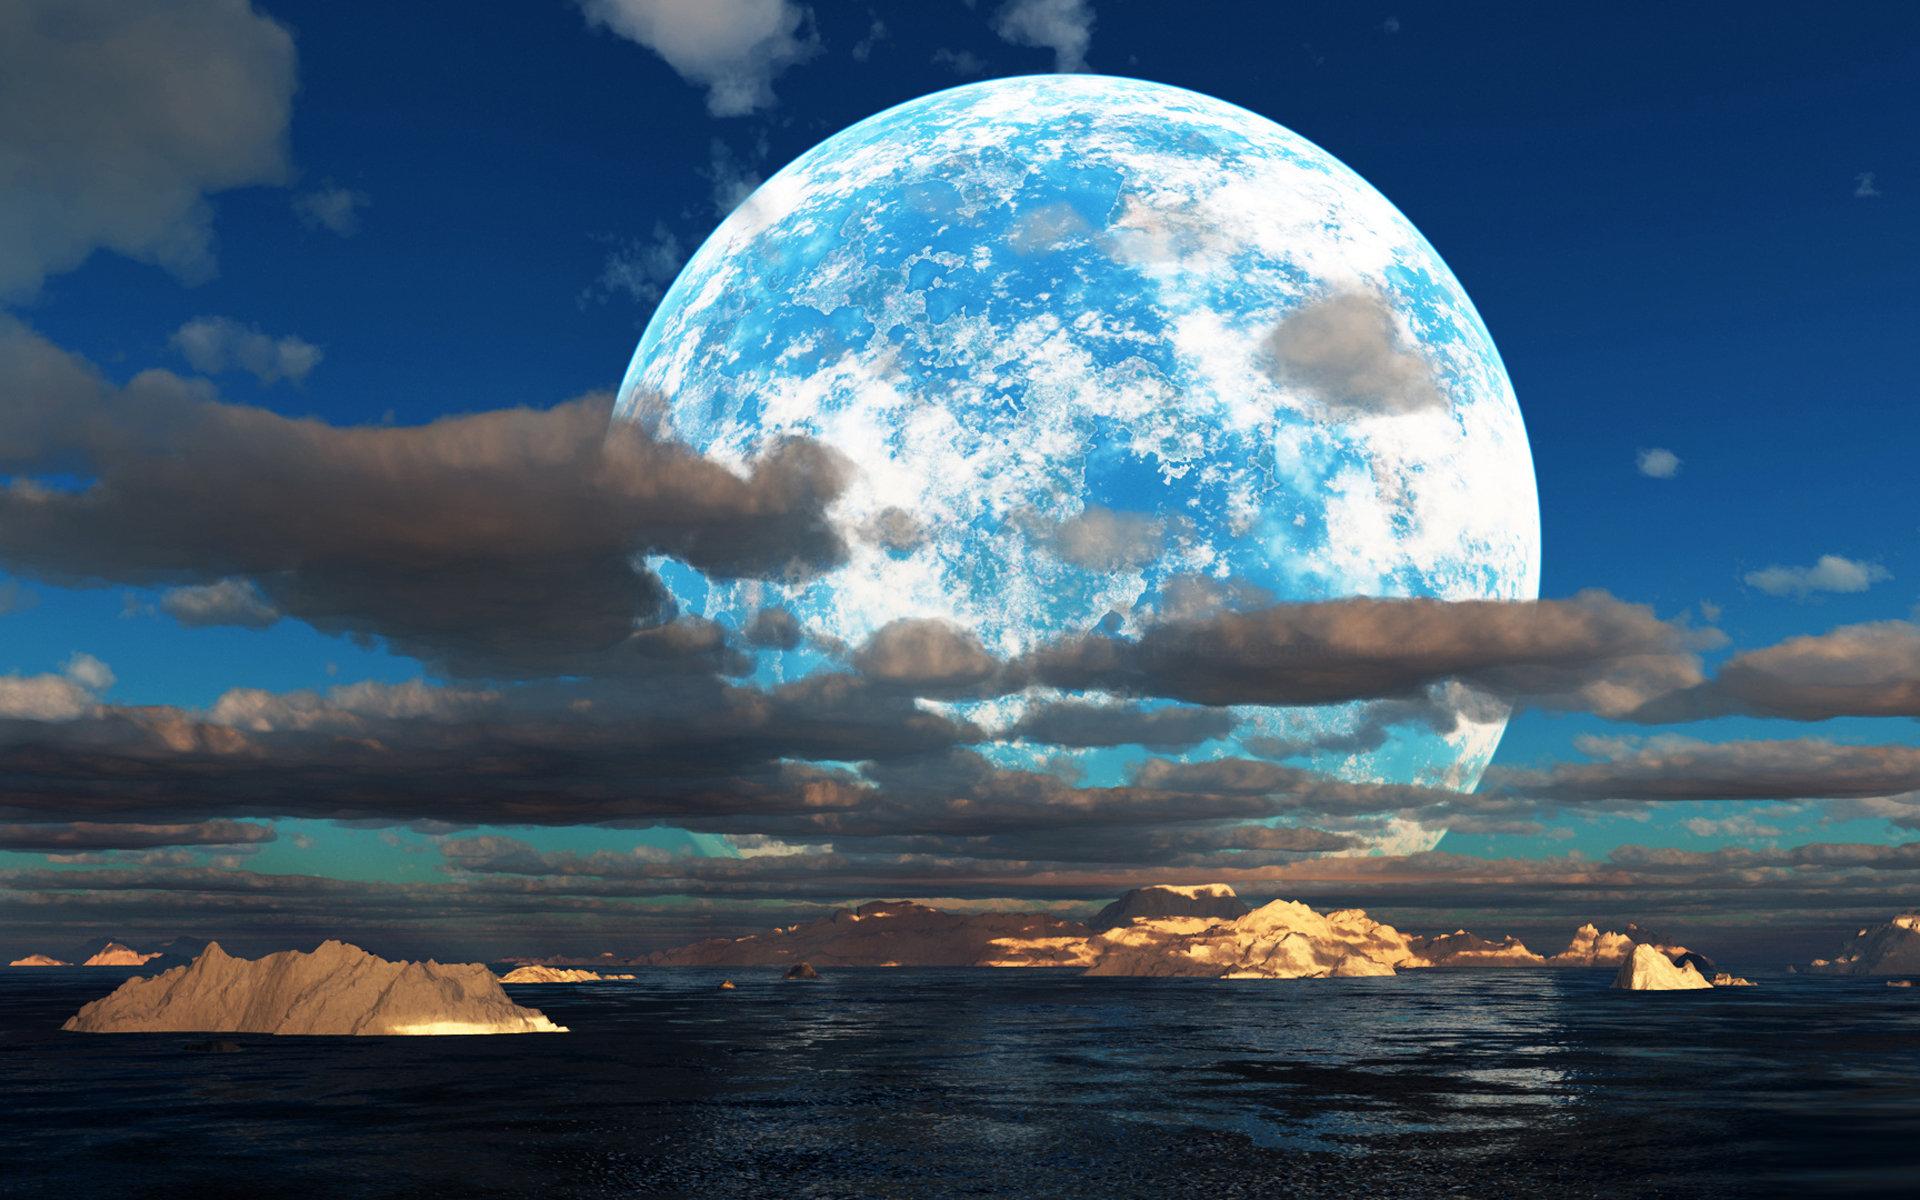 Moonlight Wallpaper Free Download 1920x1200